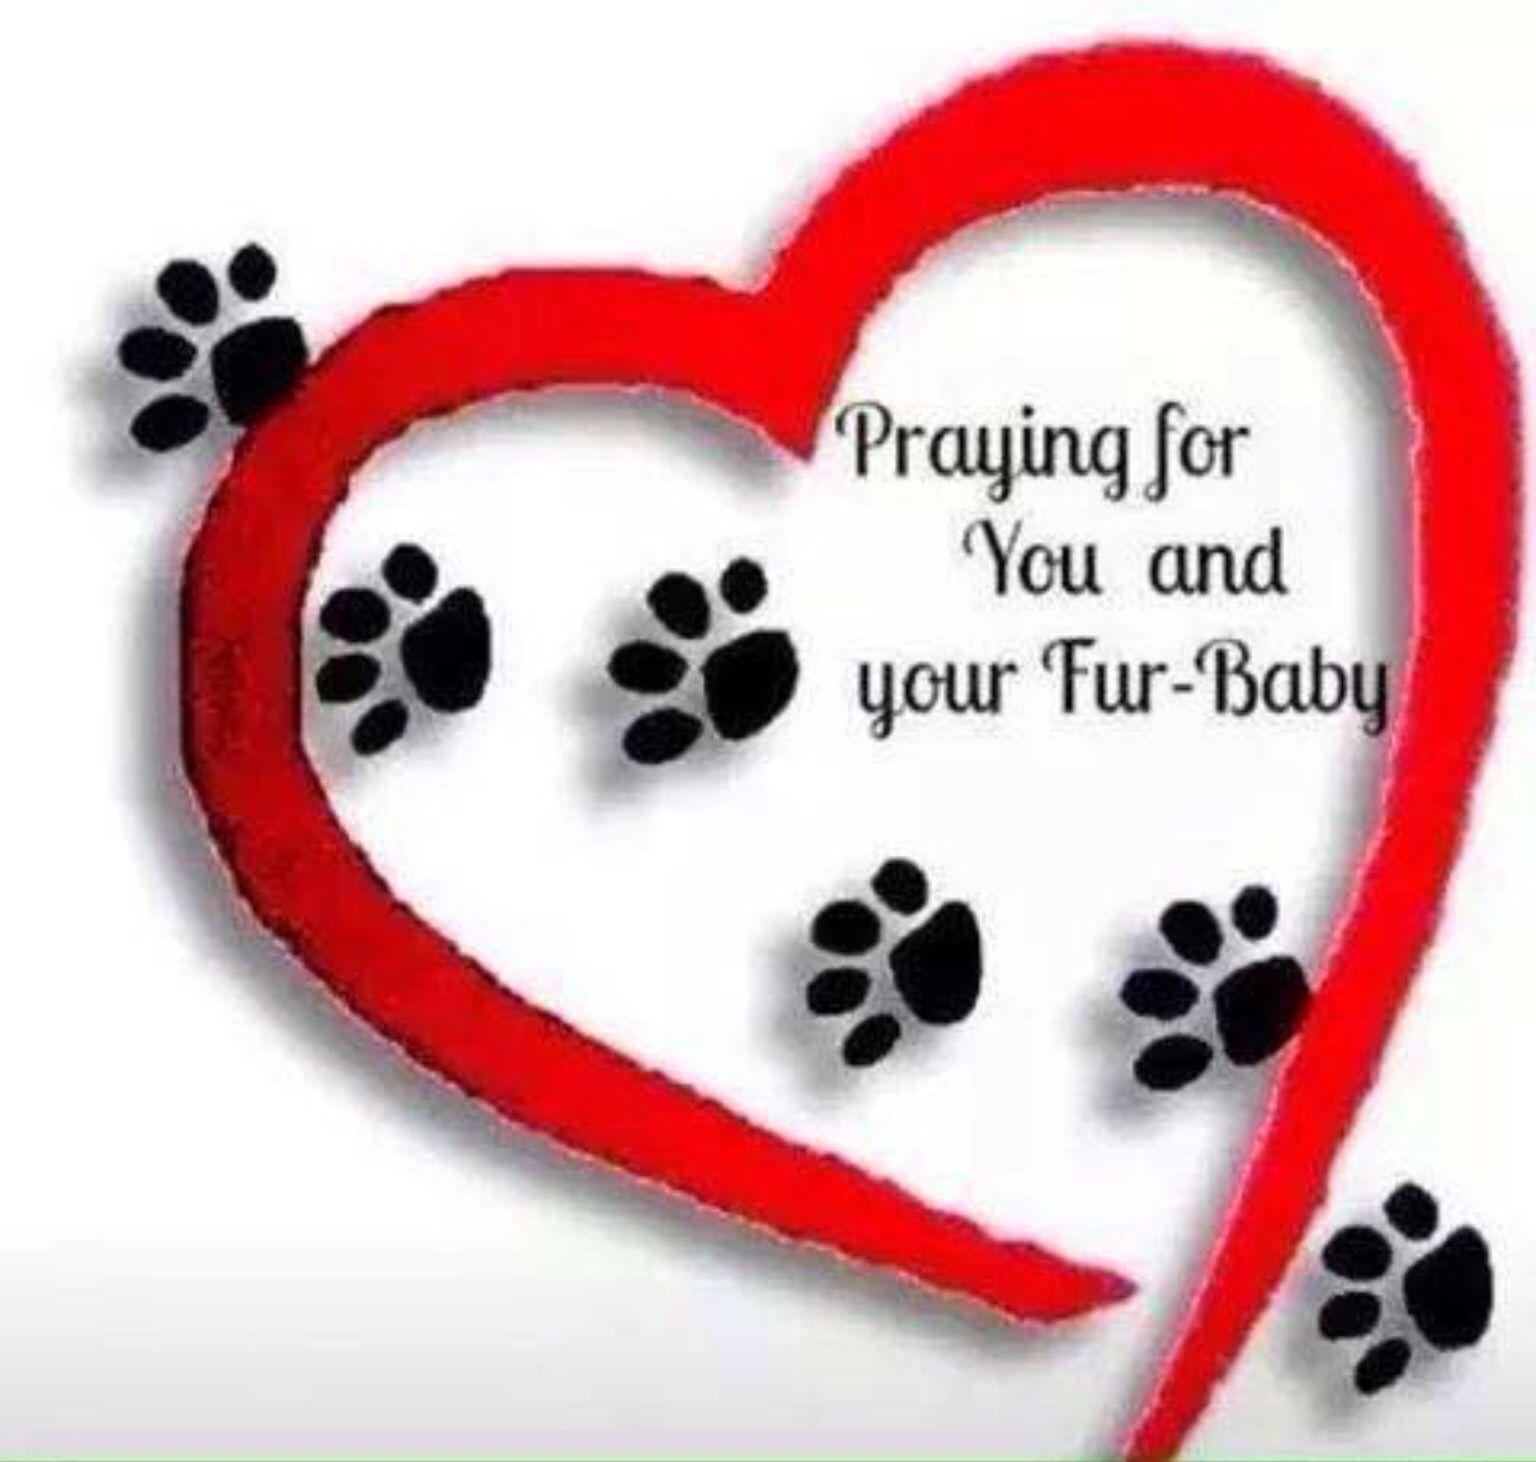 Love our fur babies